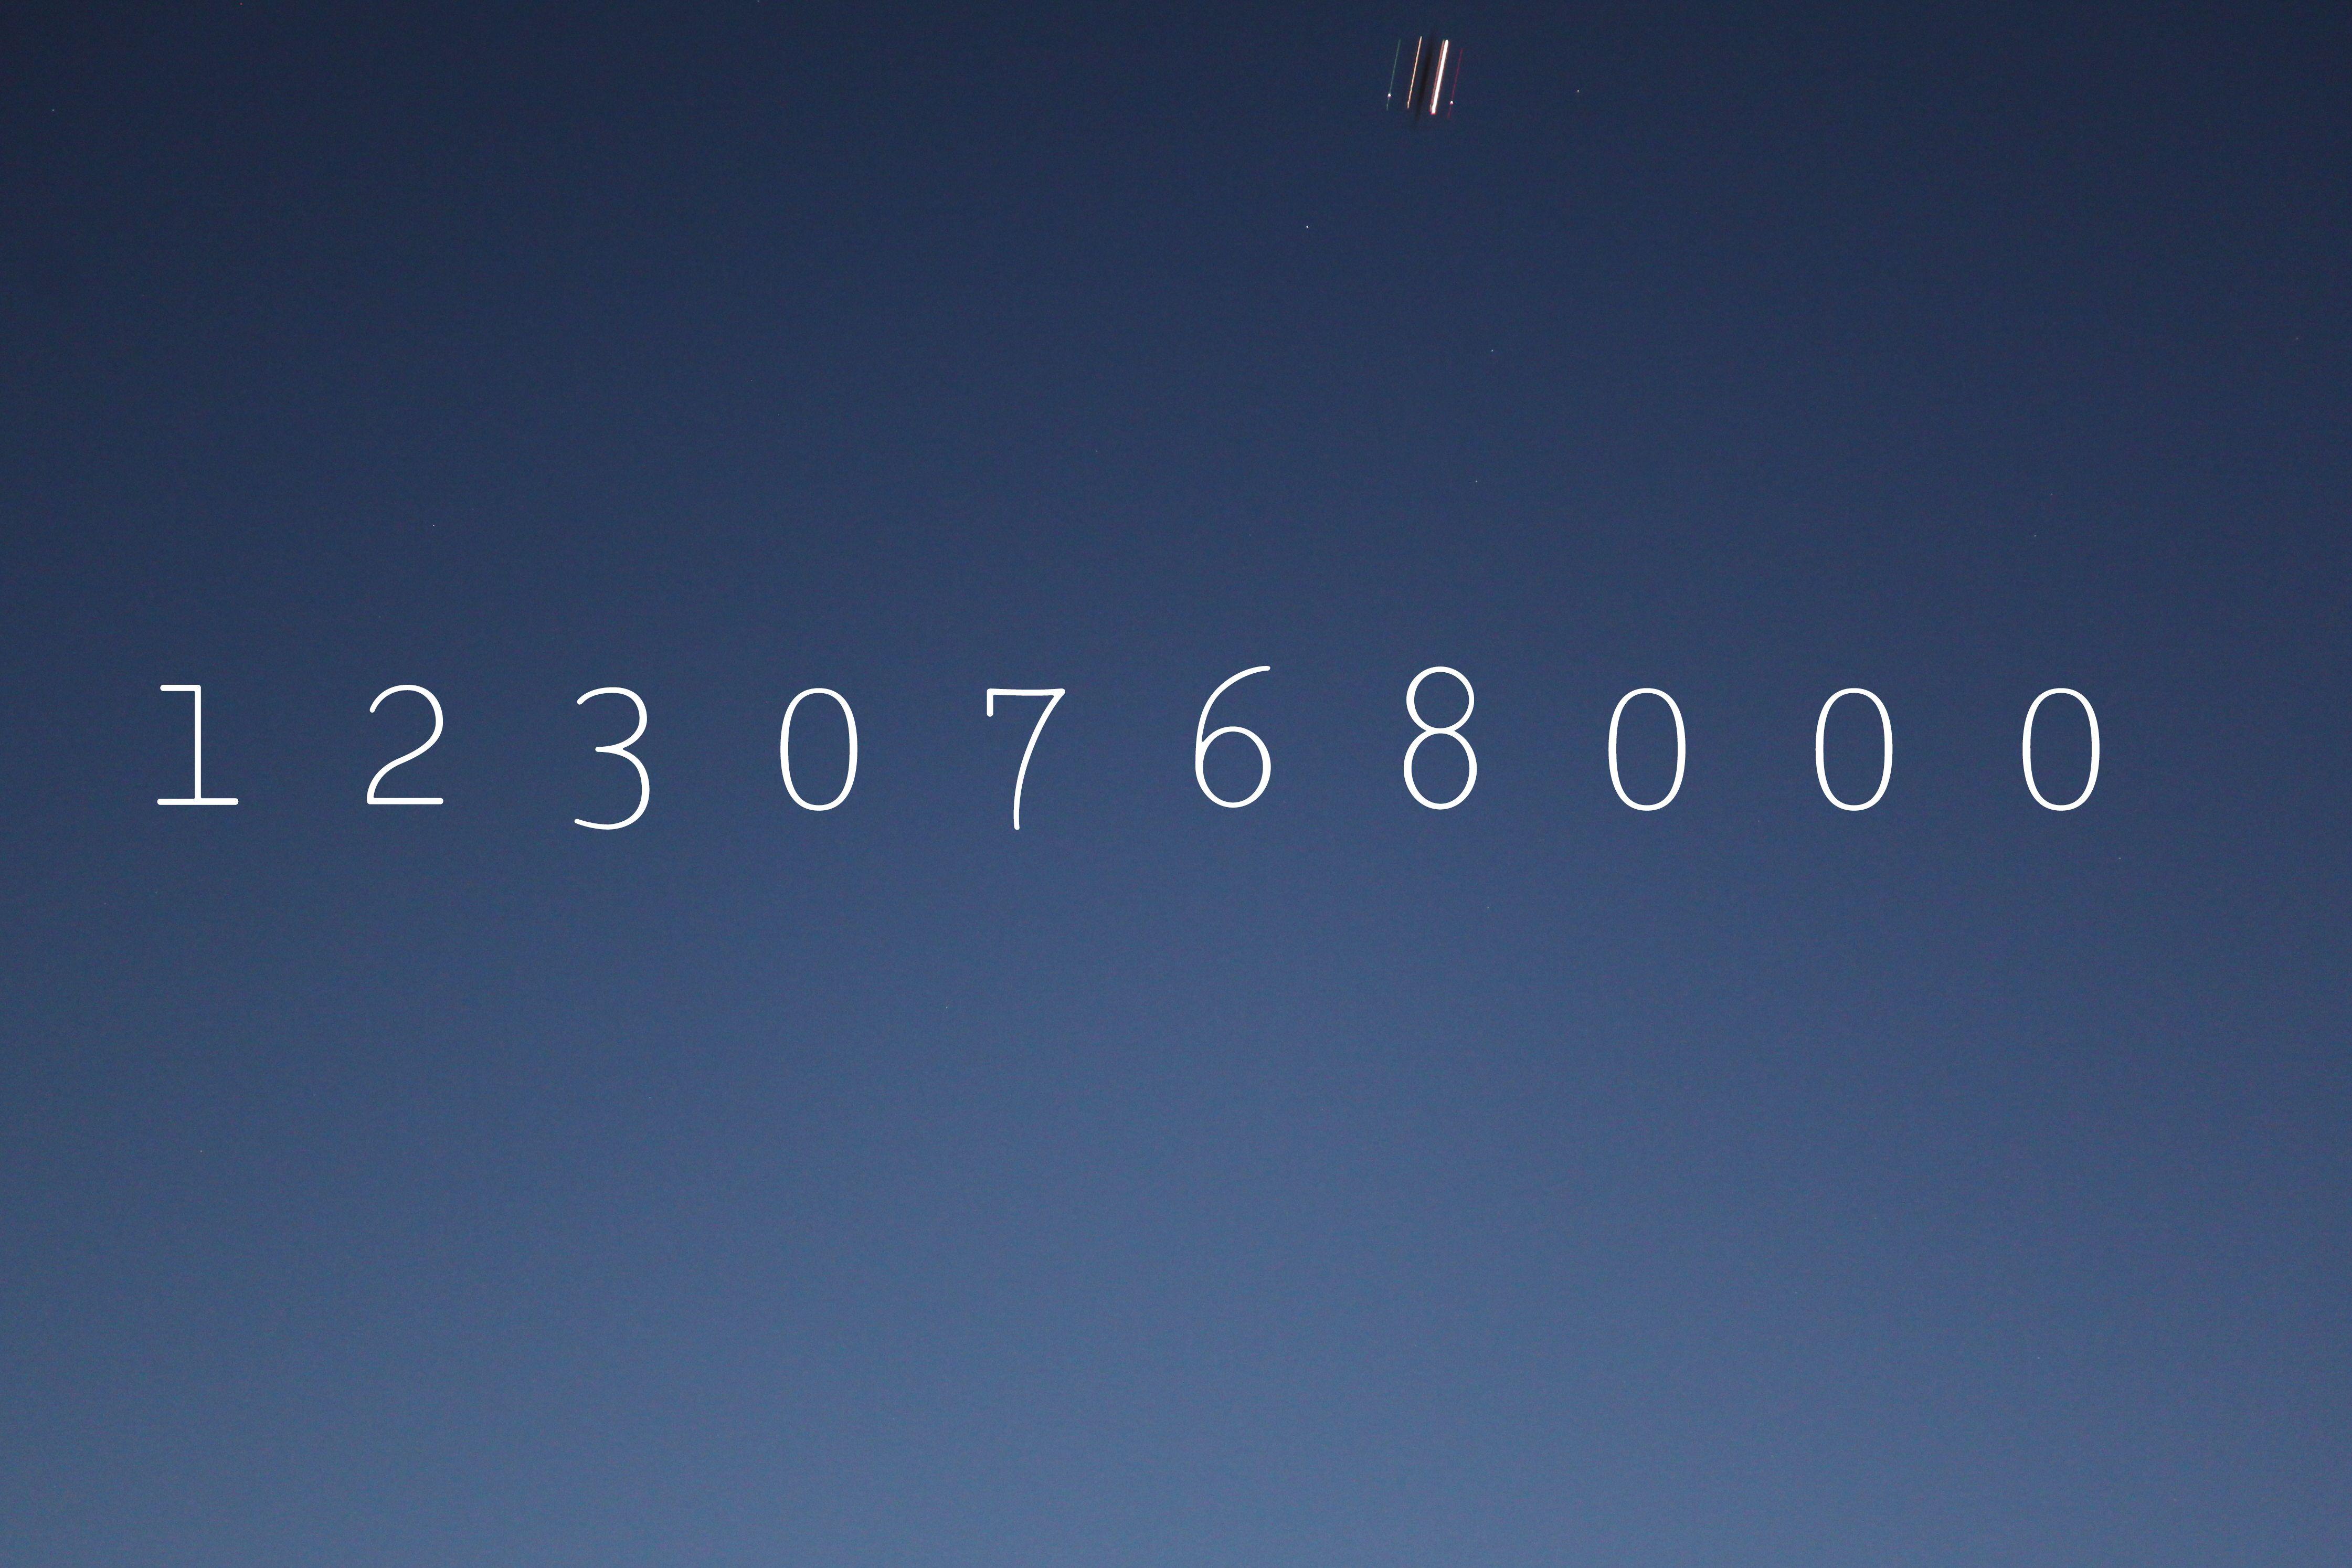 Leap Second, 31 December 2008 - 23:59:60